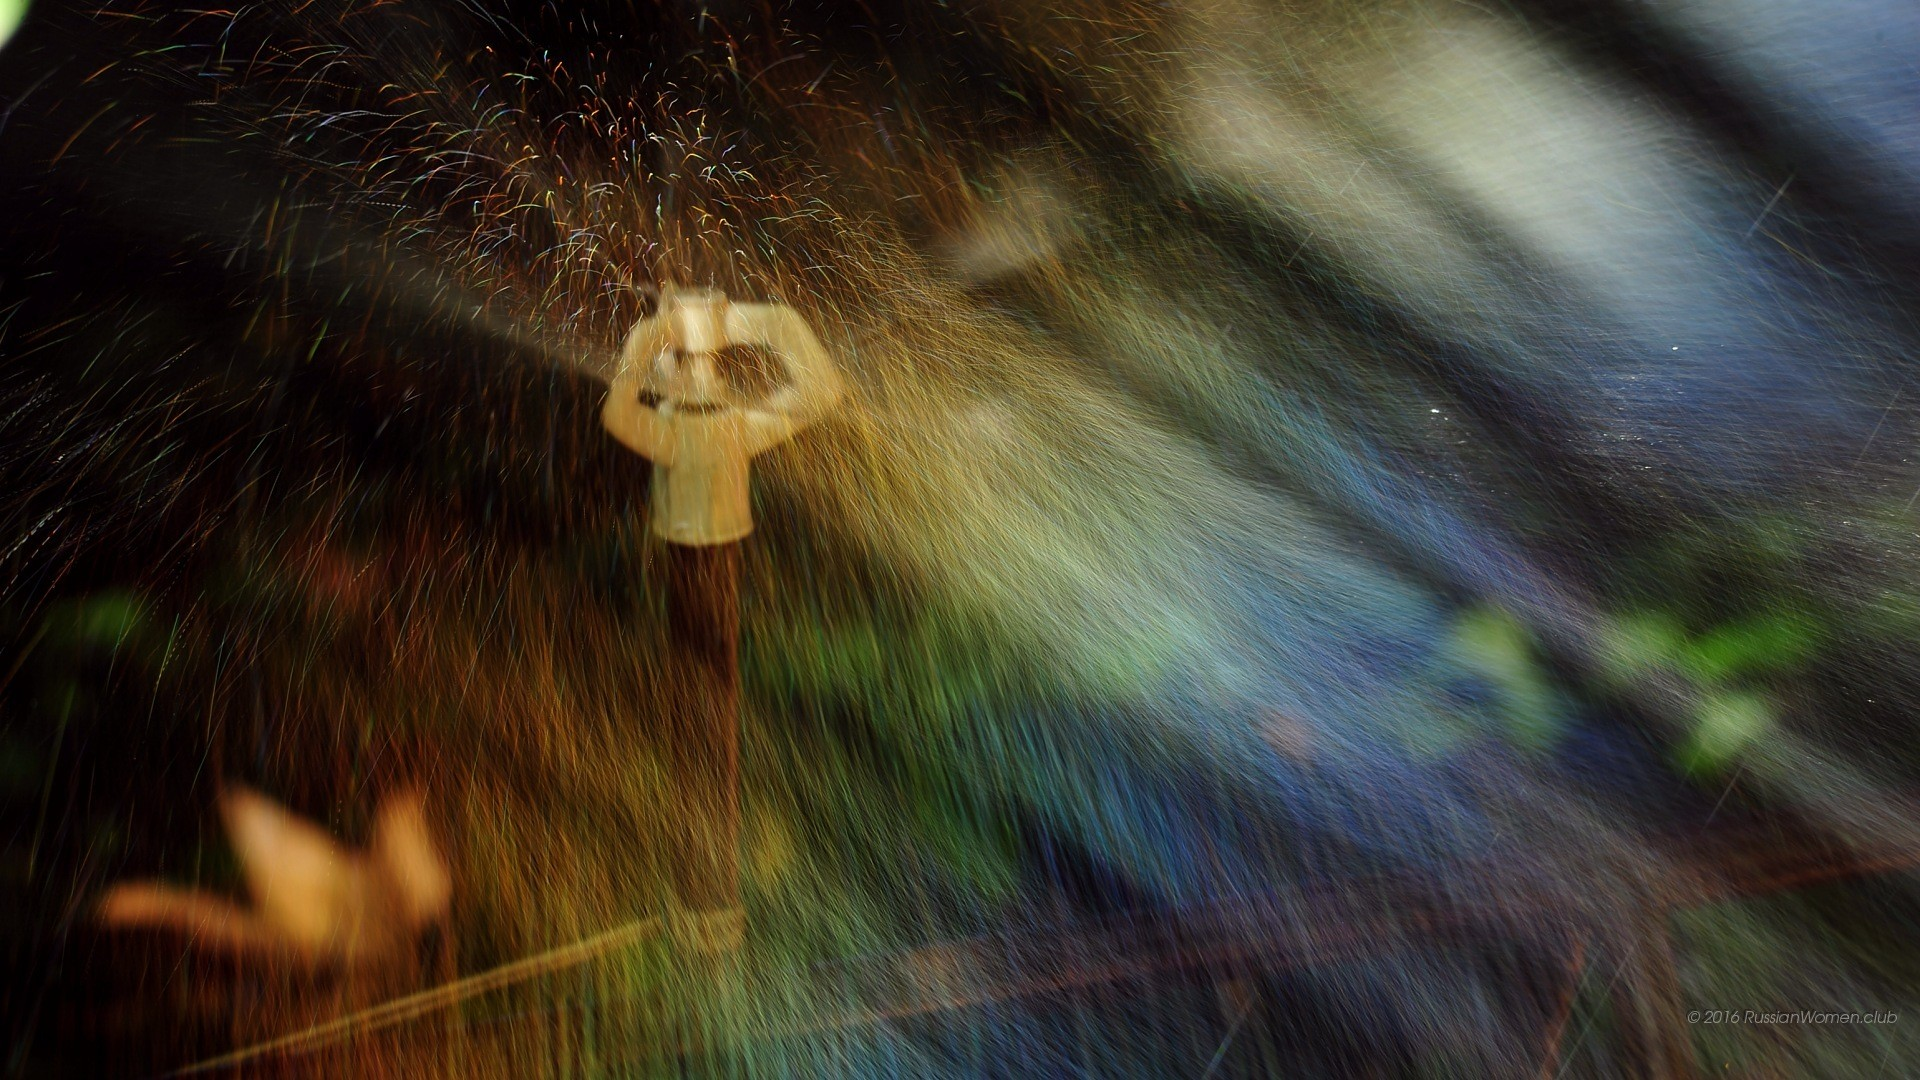 Sfondi bellissimi 79 immagini for Foto full hd per desktop